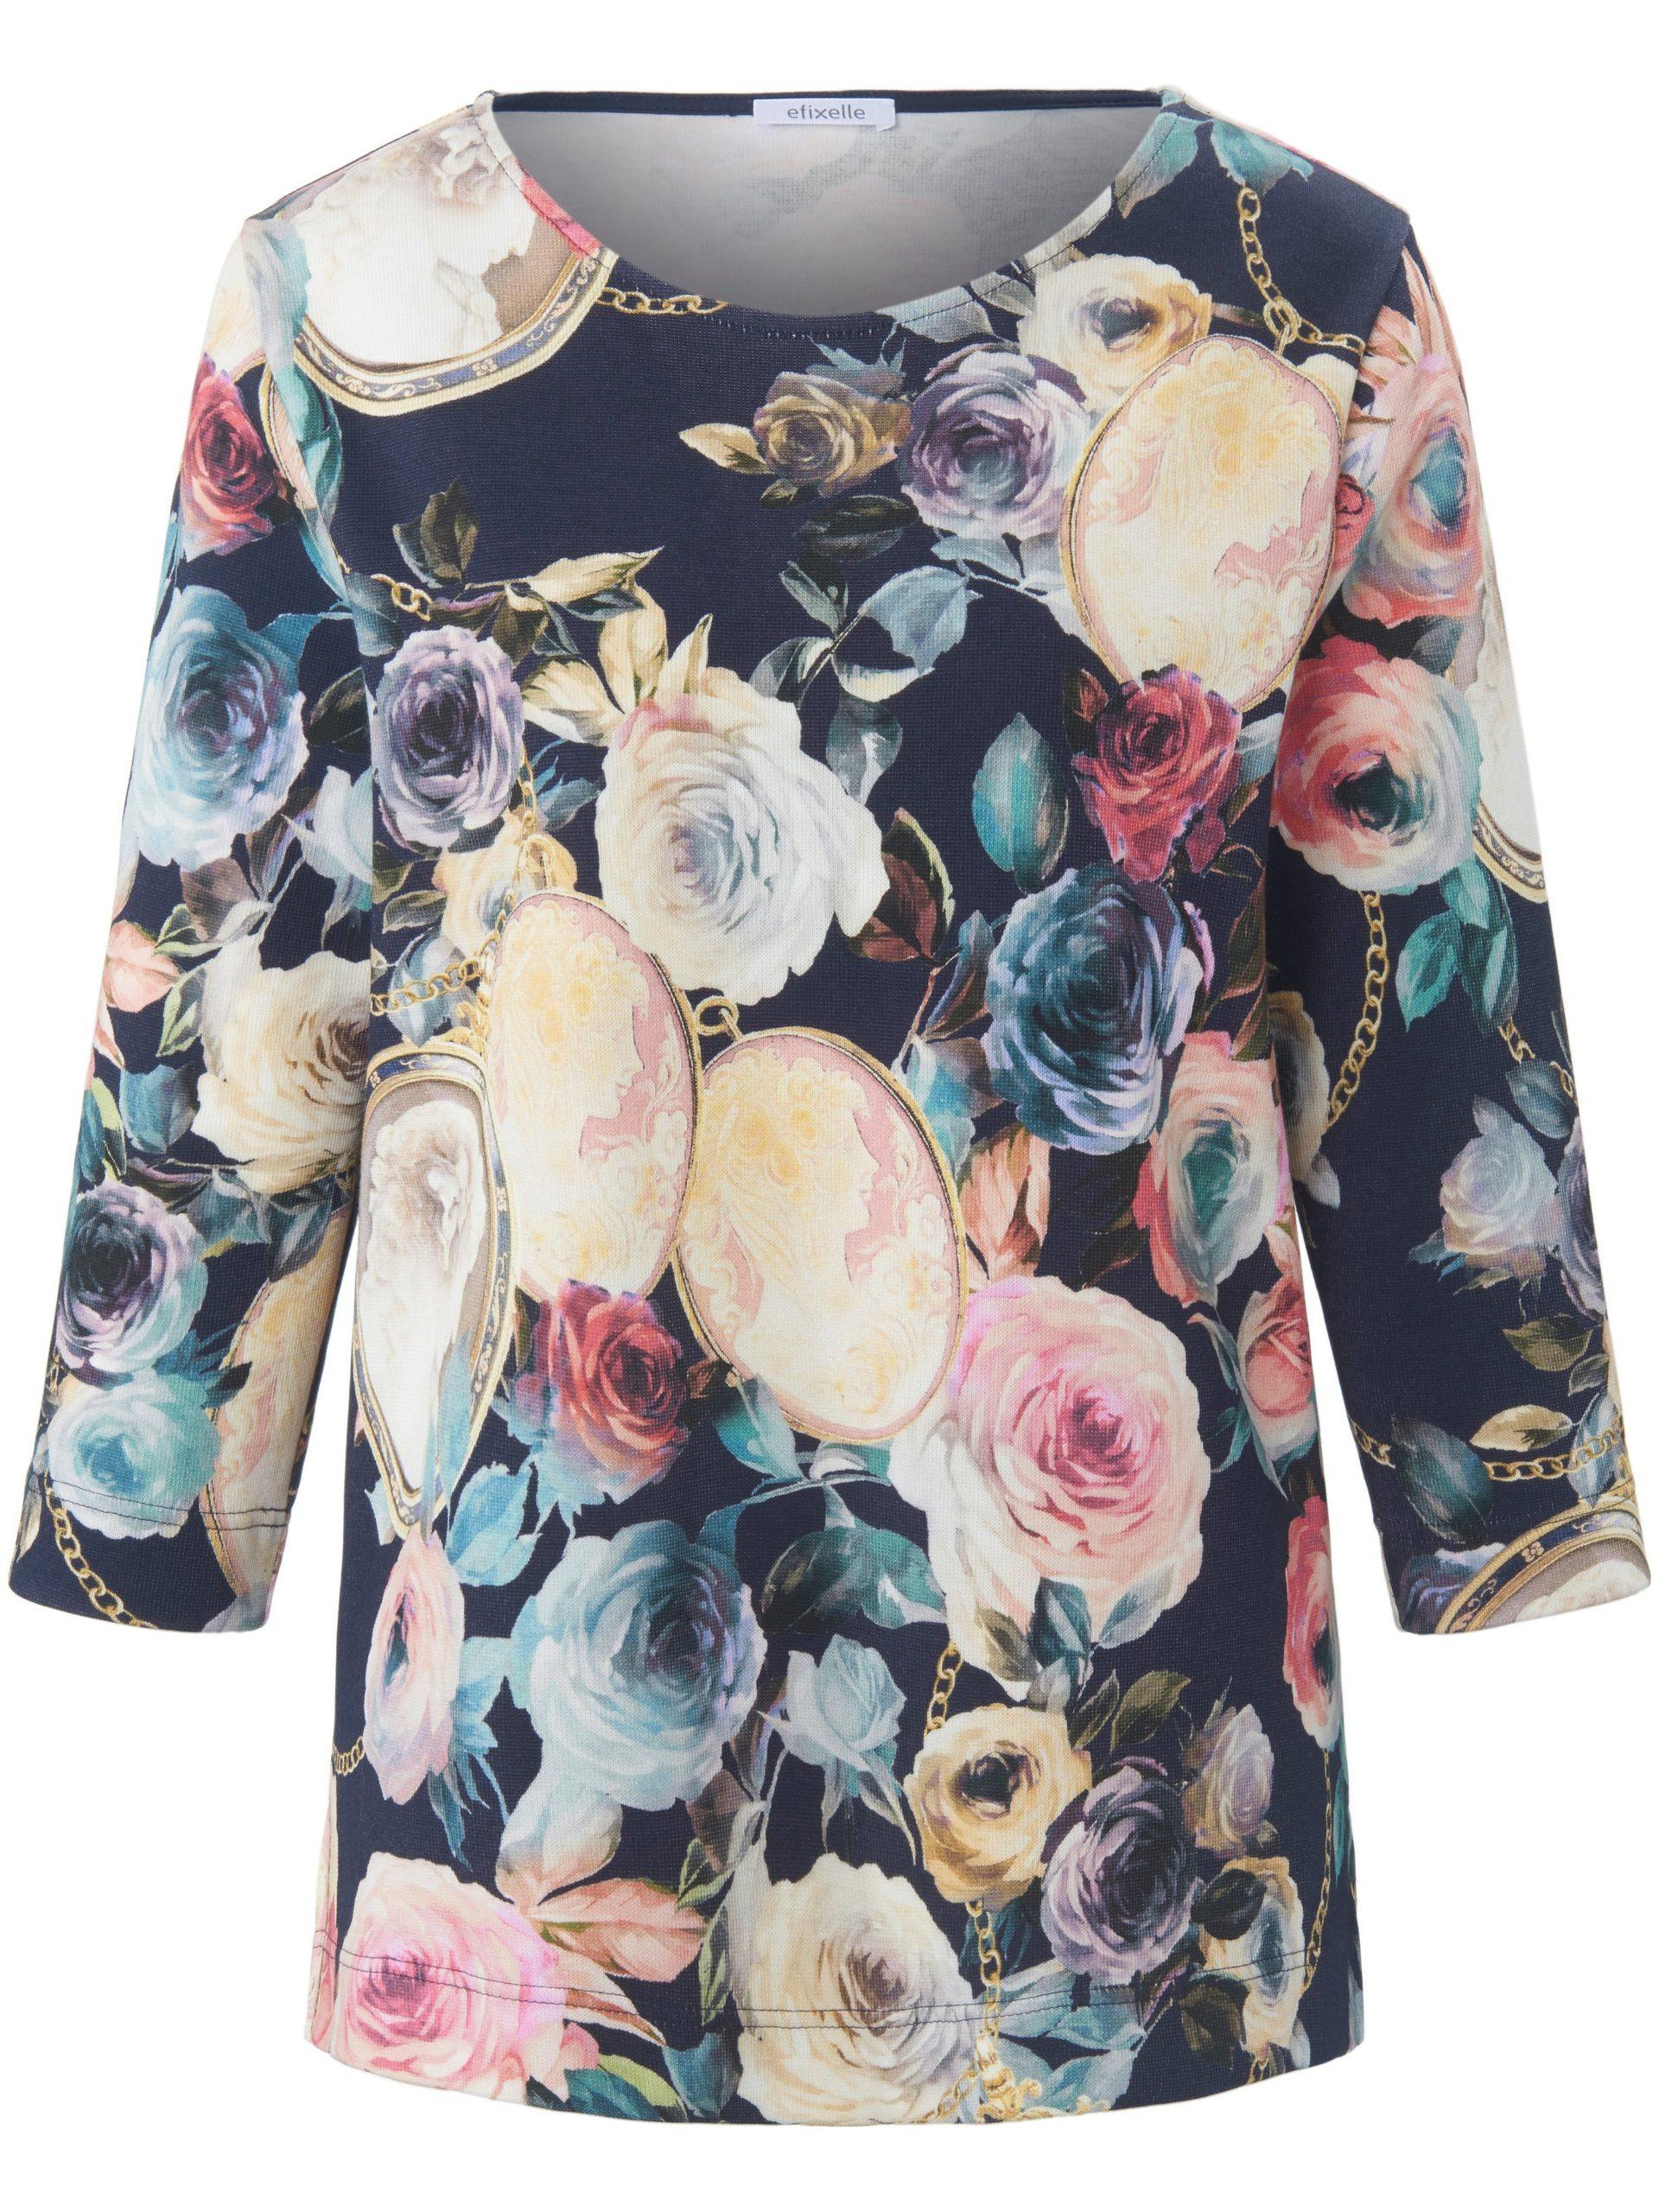 Trui-shirt met 3/4-mouwen en rozen- en stenenprint Van Efixelle multicolour Kopen